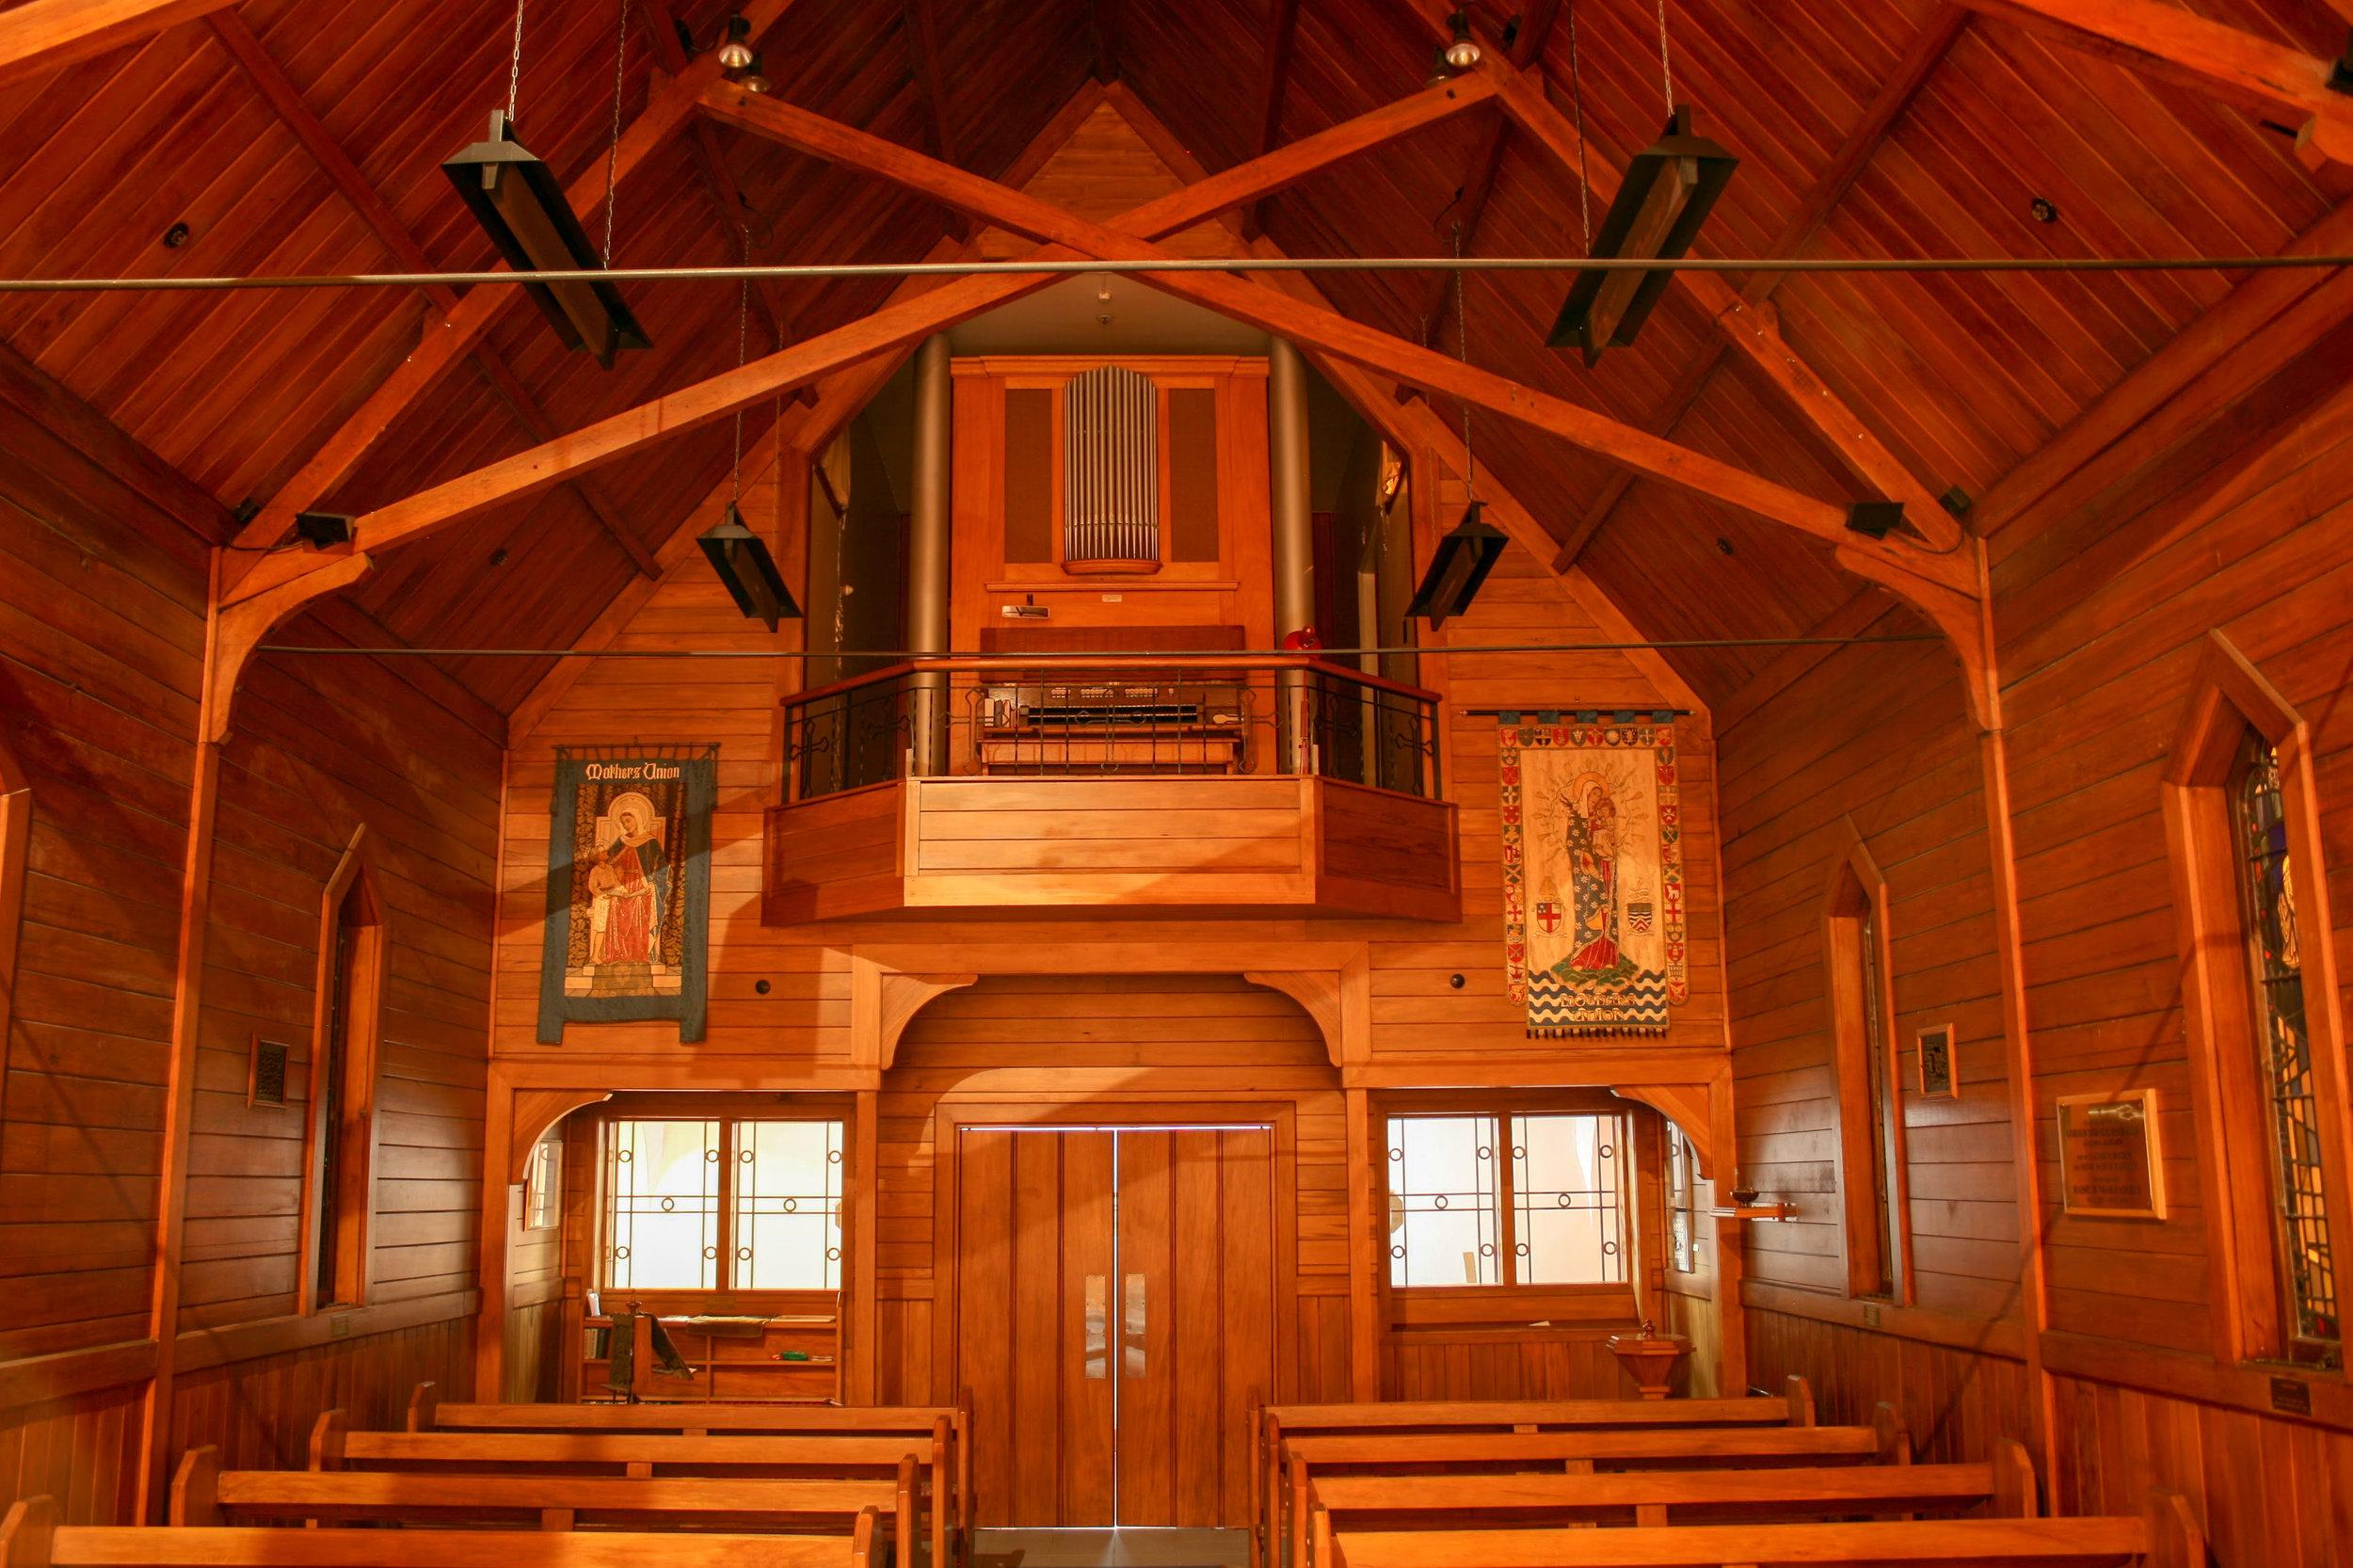 lady-chapel-organ.jpg